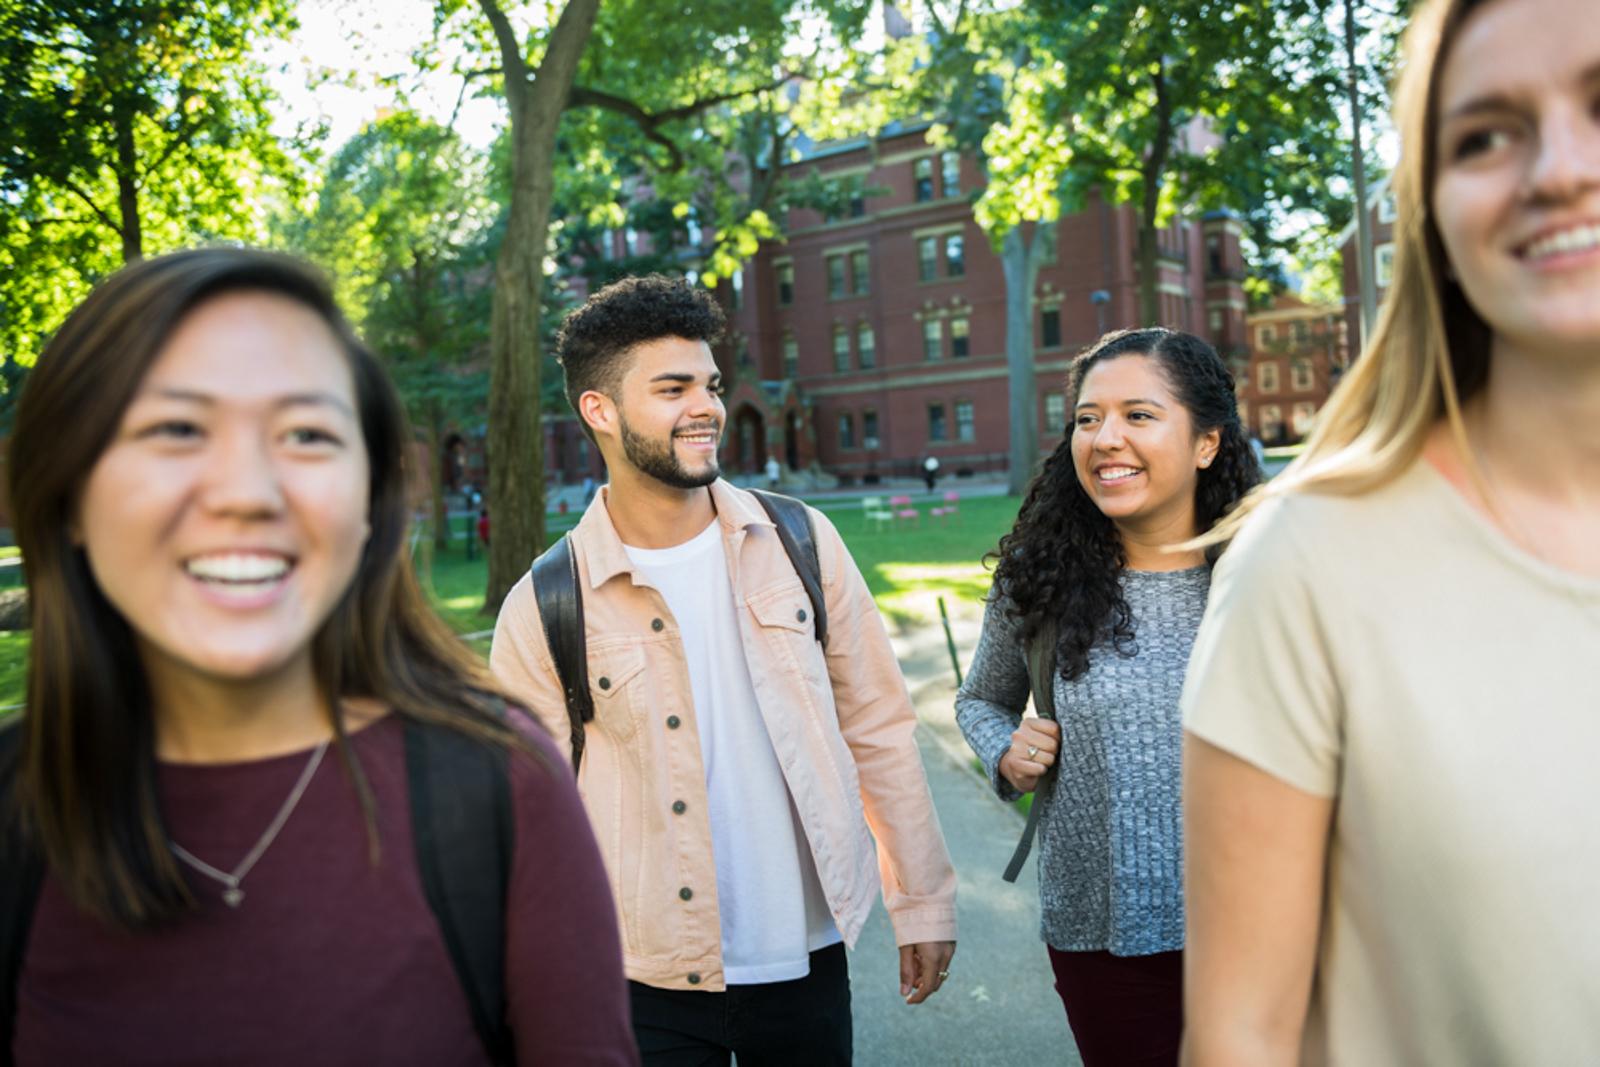 Students walking around campus, smiling